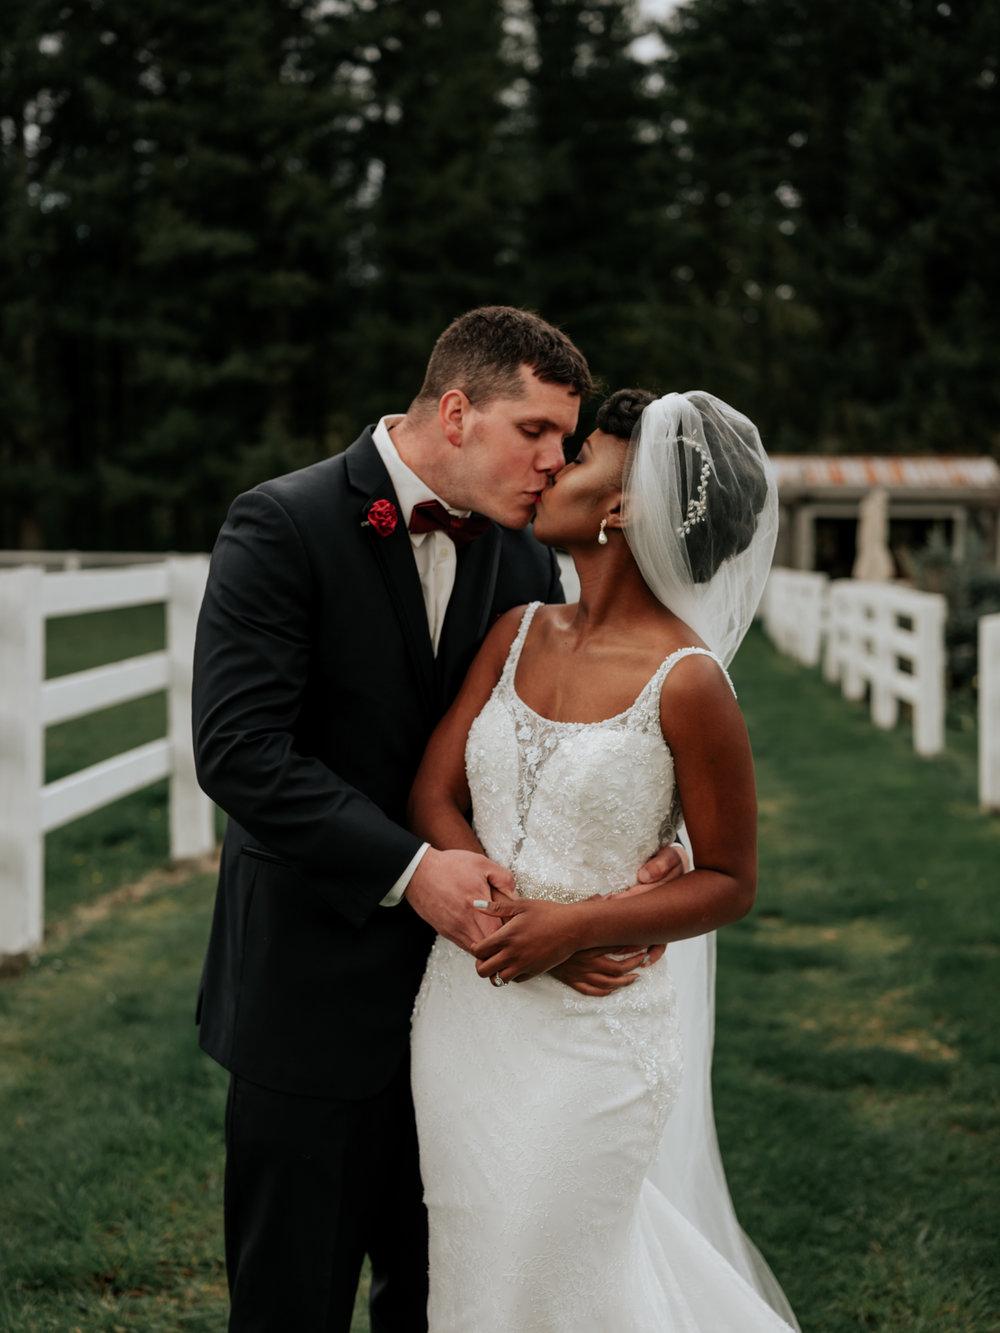 Stolen Glimpses Seattle Wedding Photographer at Rein Fire Ranch 38.jpg